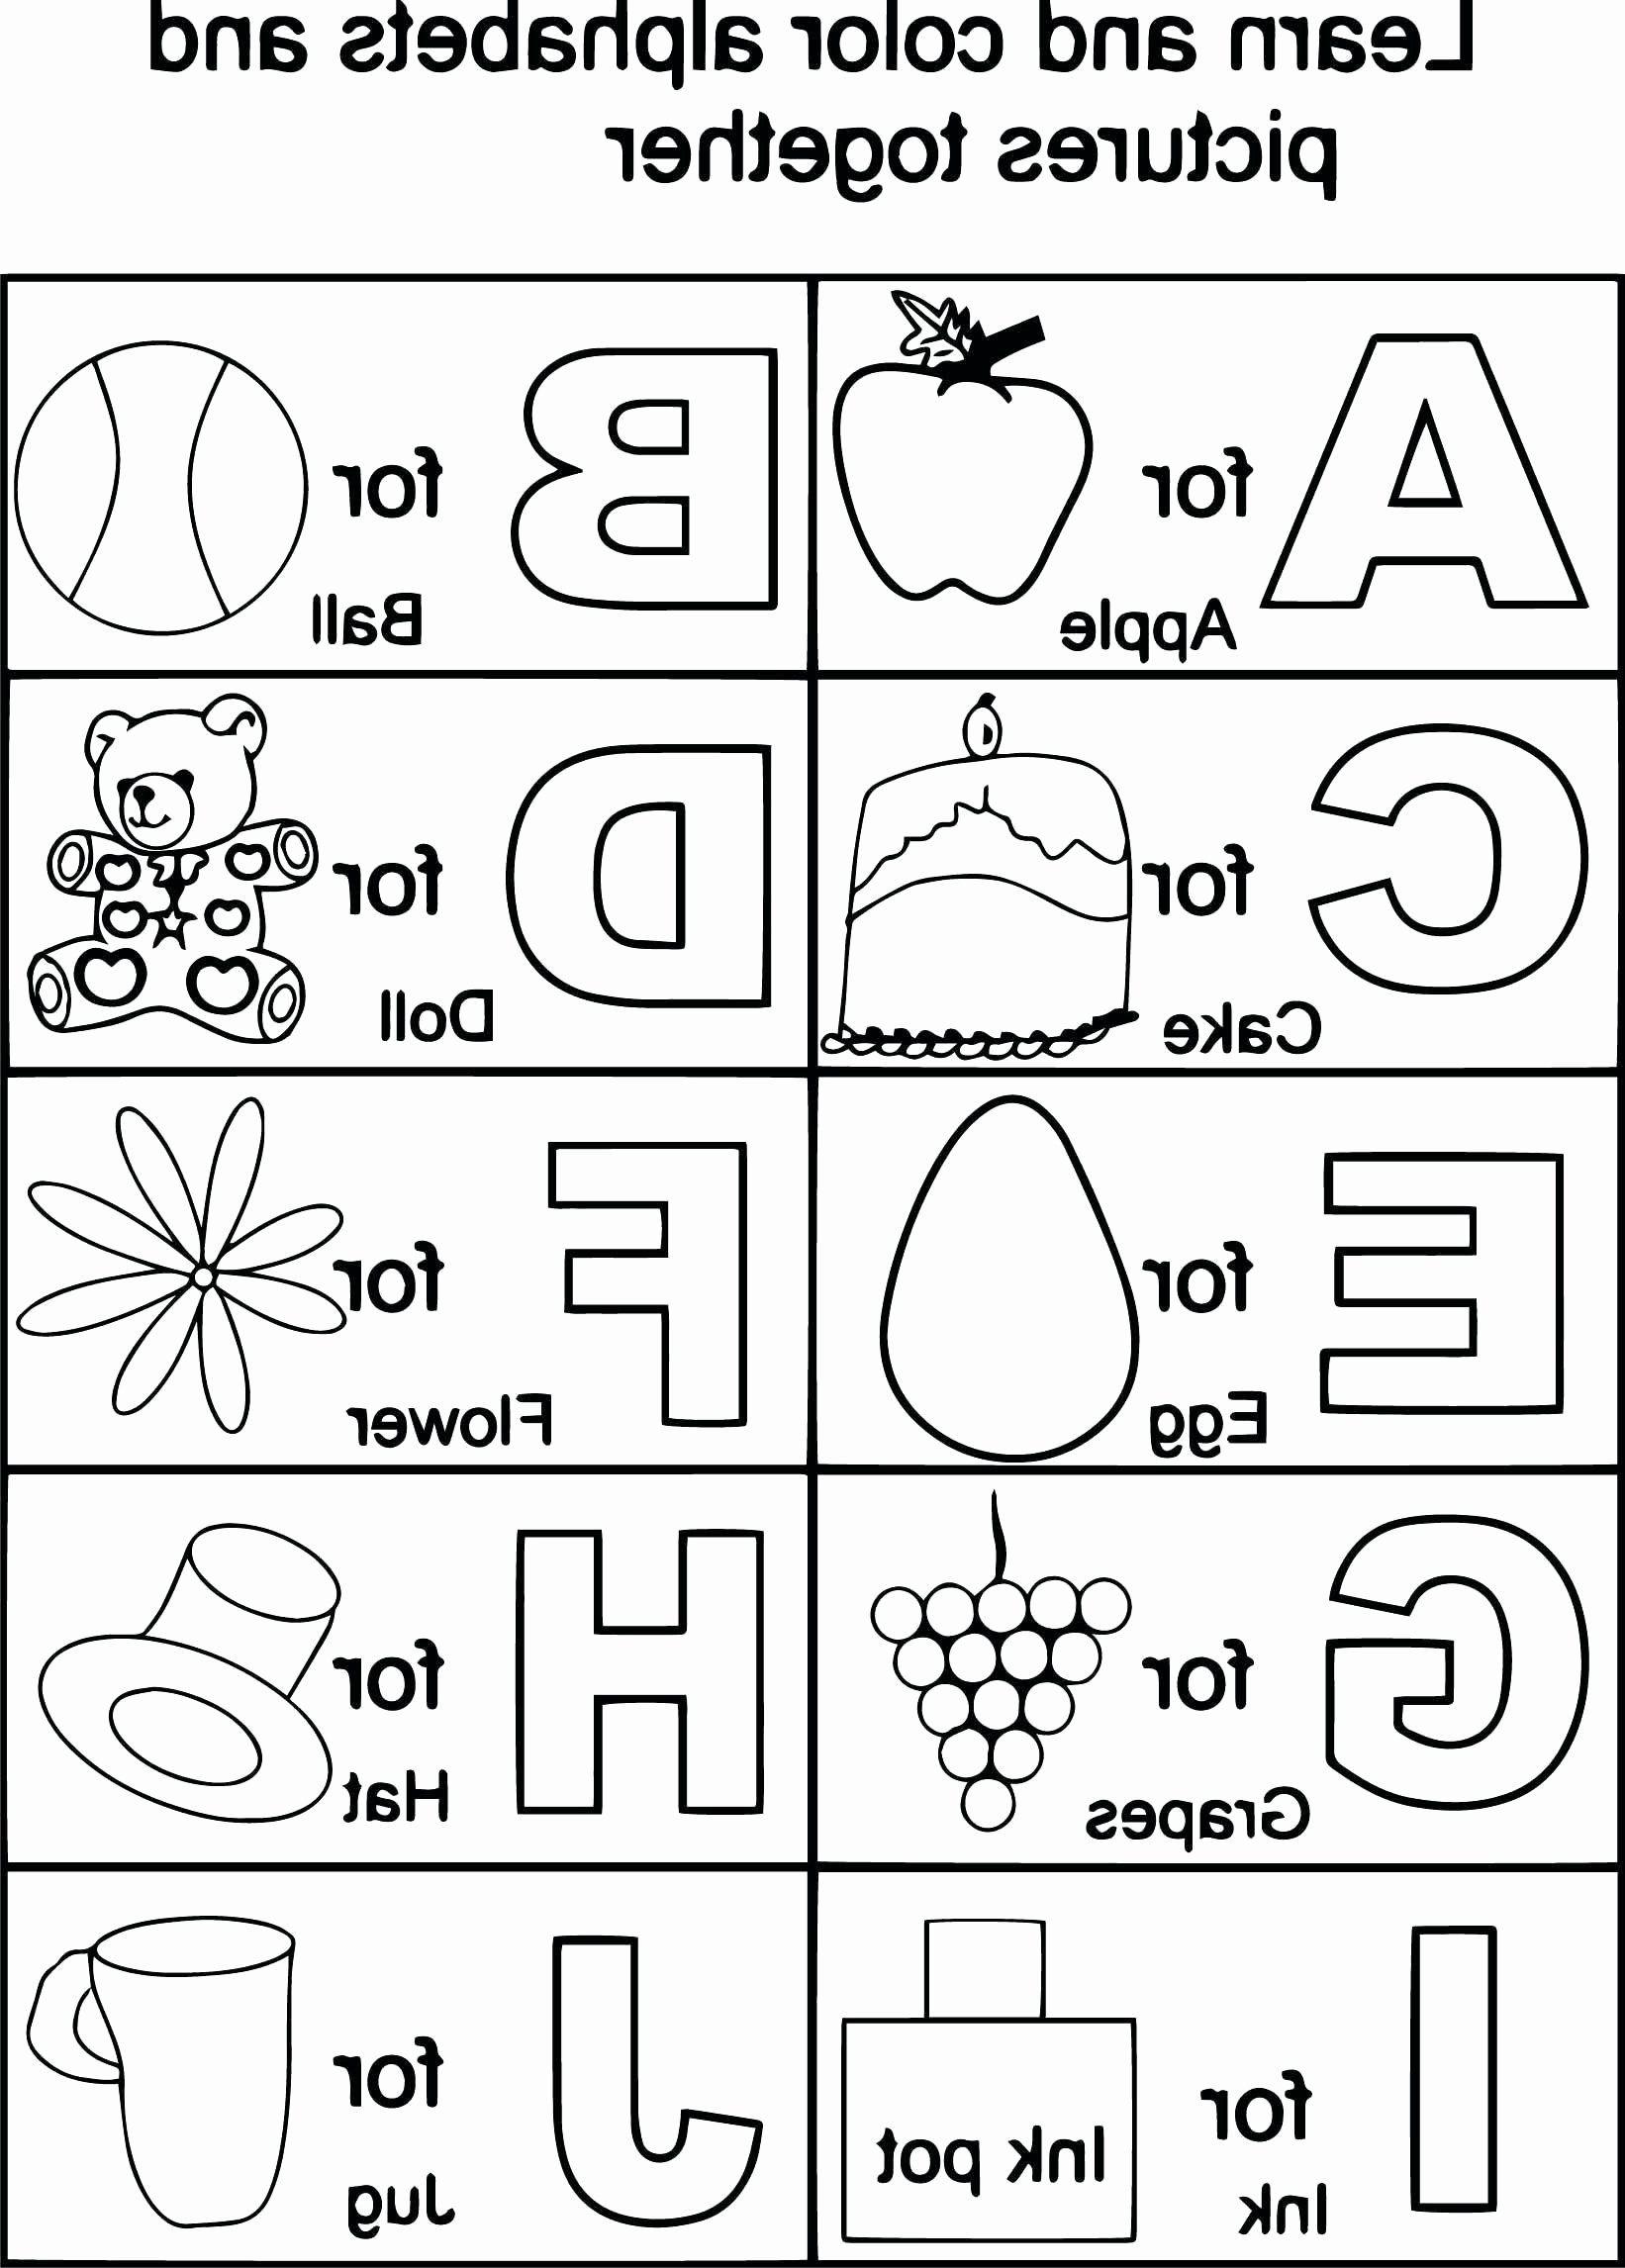 Free Printable Letter Coloring Pages Unique Printable Letter Coloring Pages Highendpaper Alphabet Coloring Pages Christmas Coloring Pages Abc Coloring